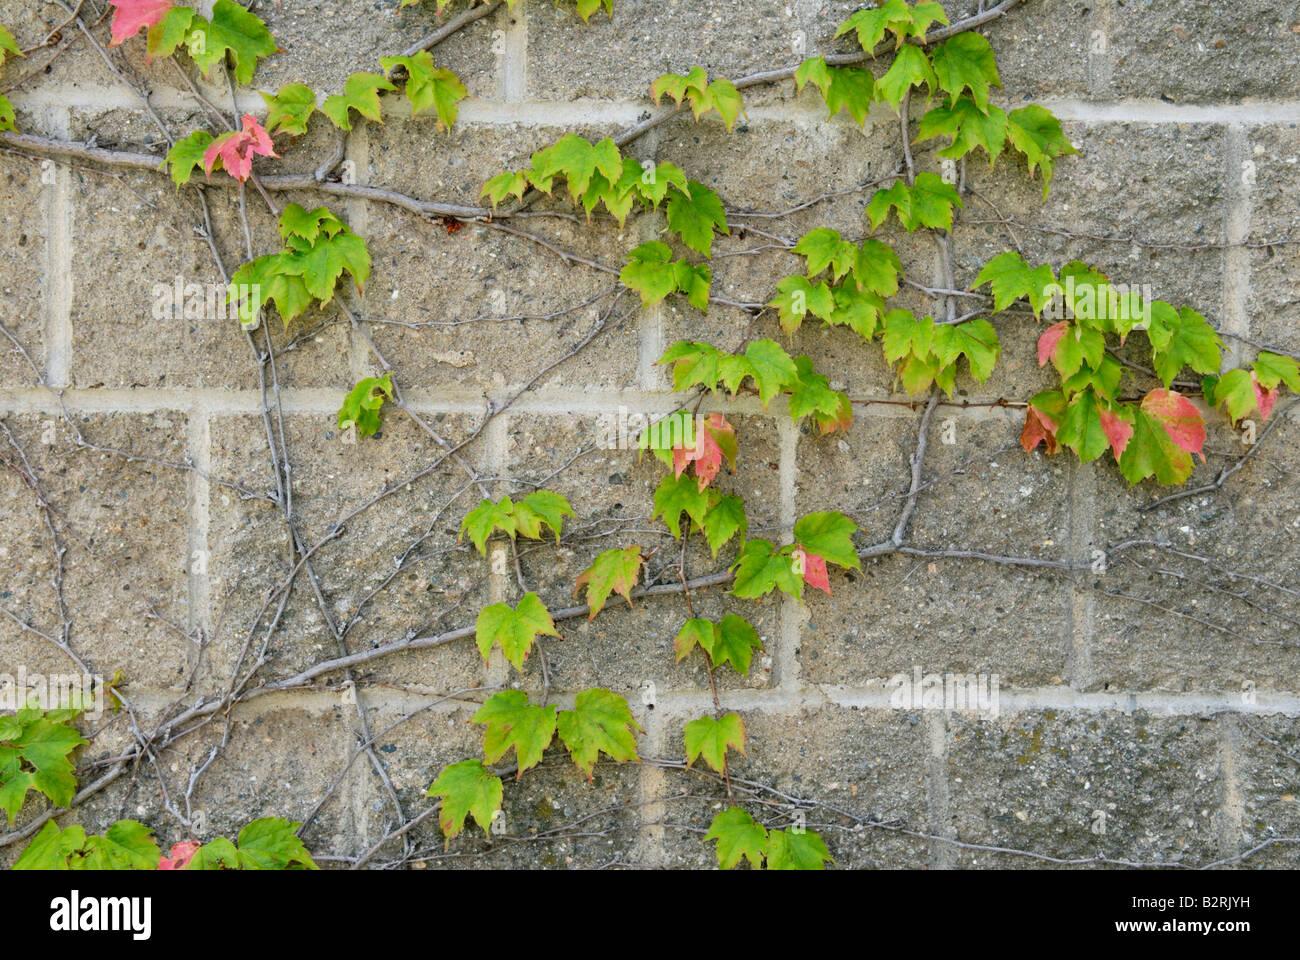 Japanische Schlingpflanze Parthenocissus tricuspidata Stockbild